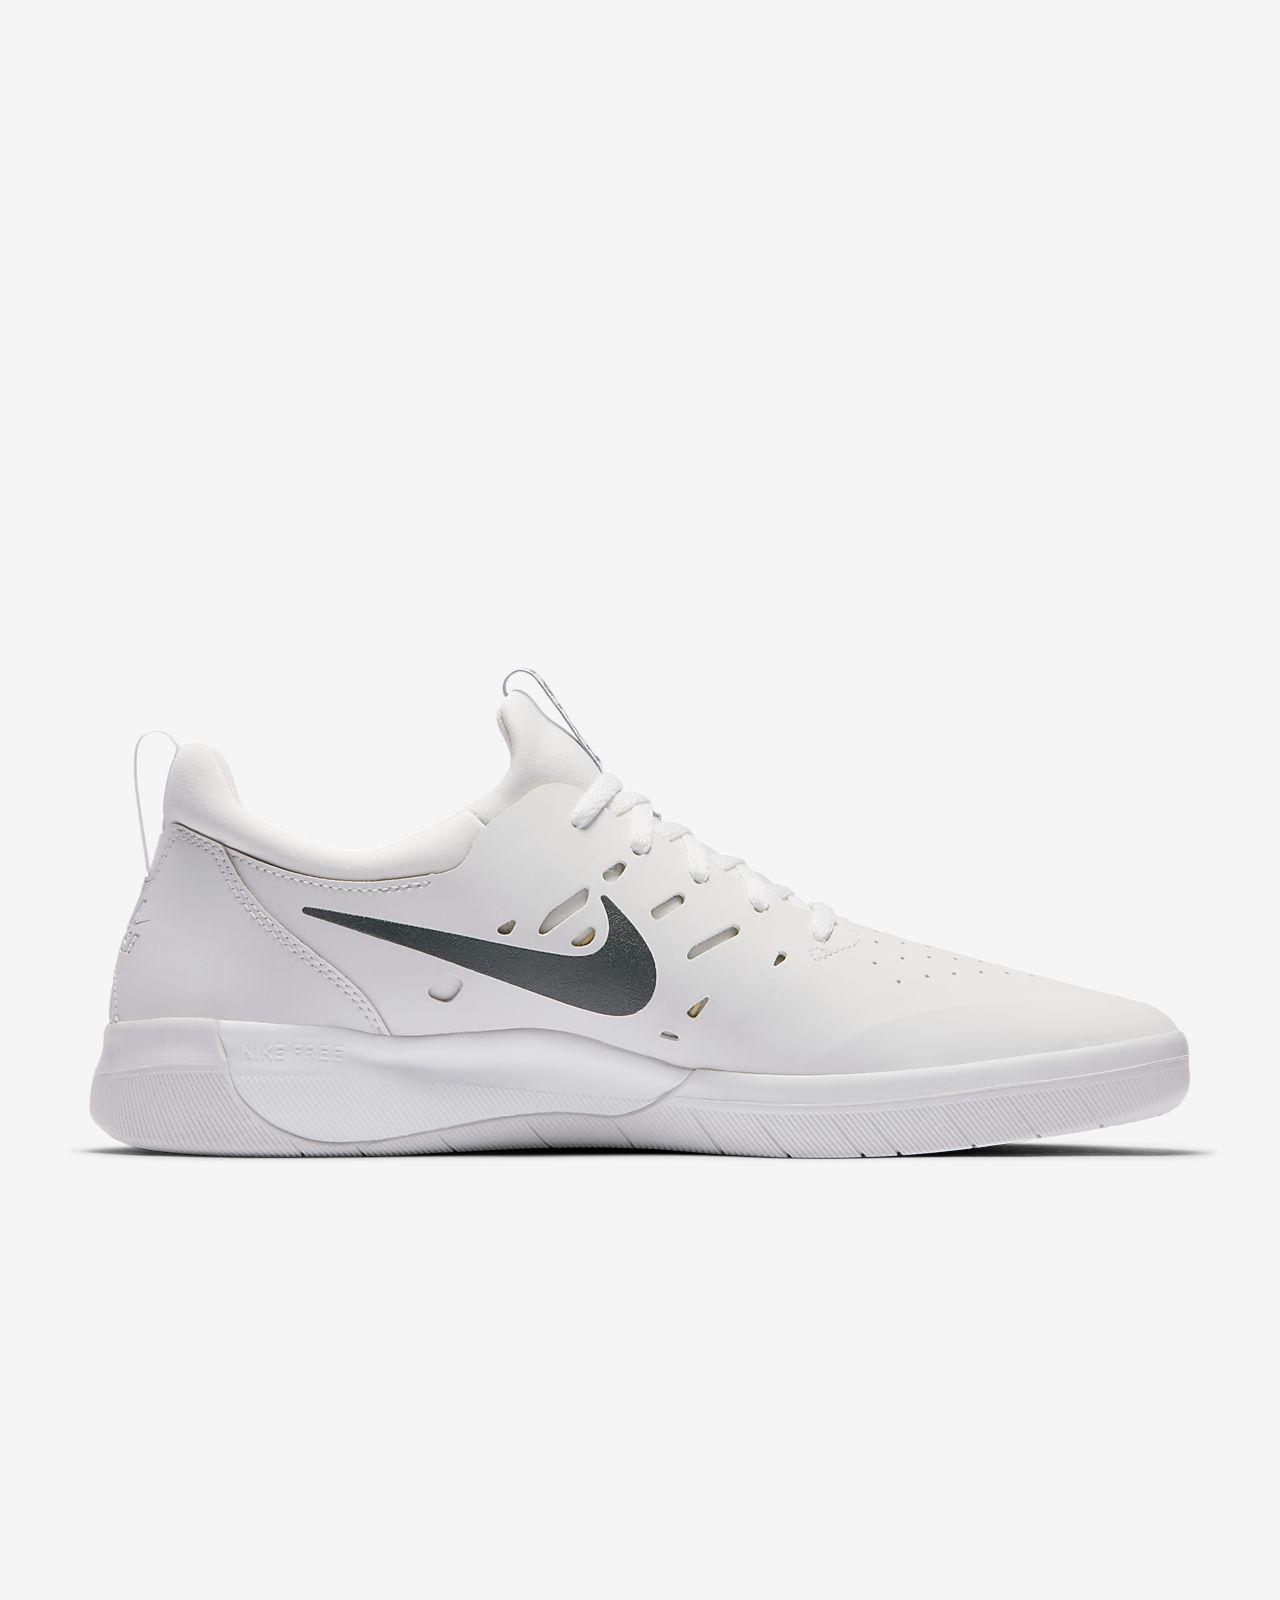 Nike SB Nyjah Free Skateboarding Trainers In Black AA4272 001